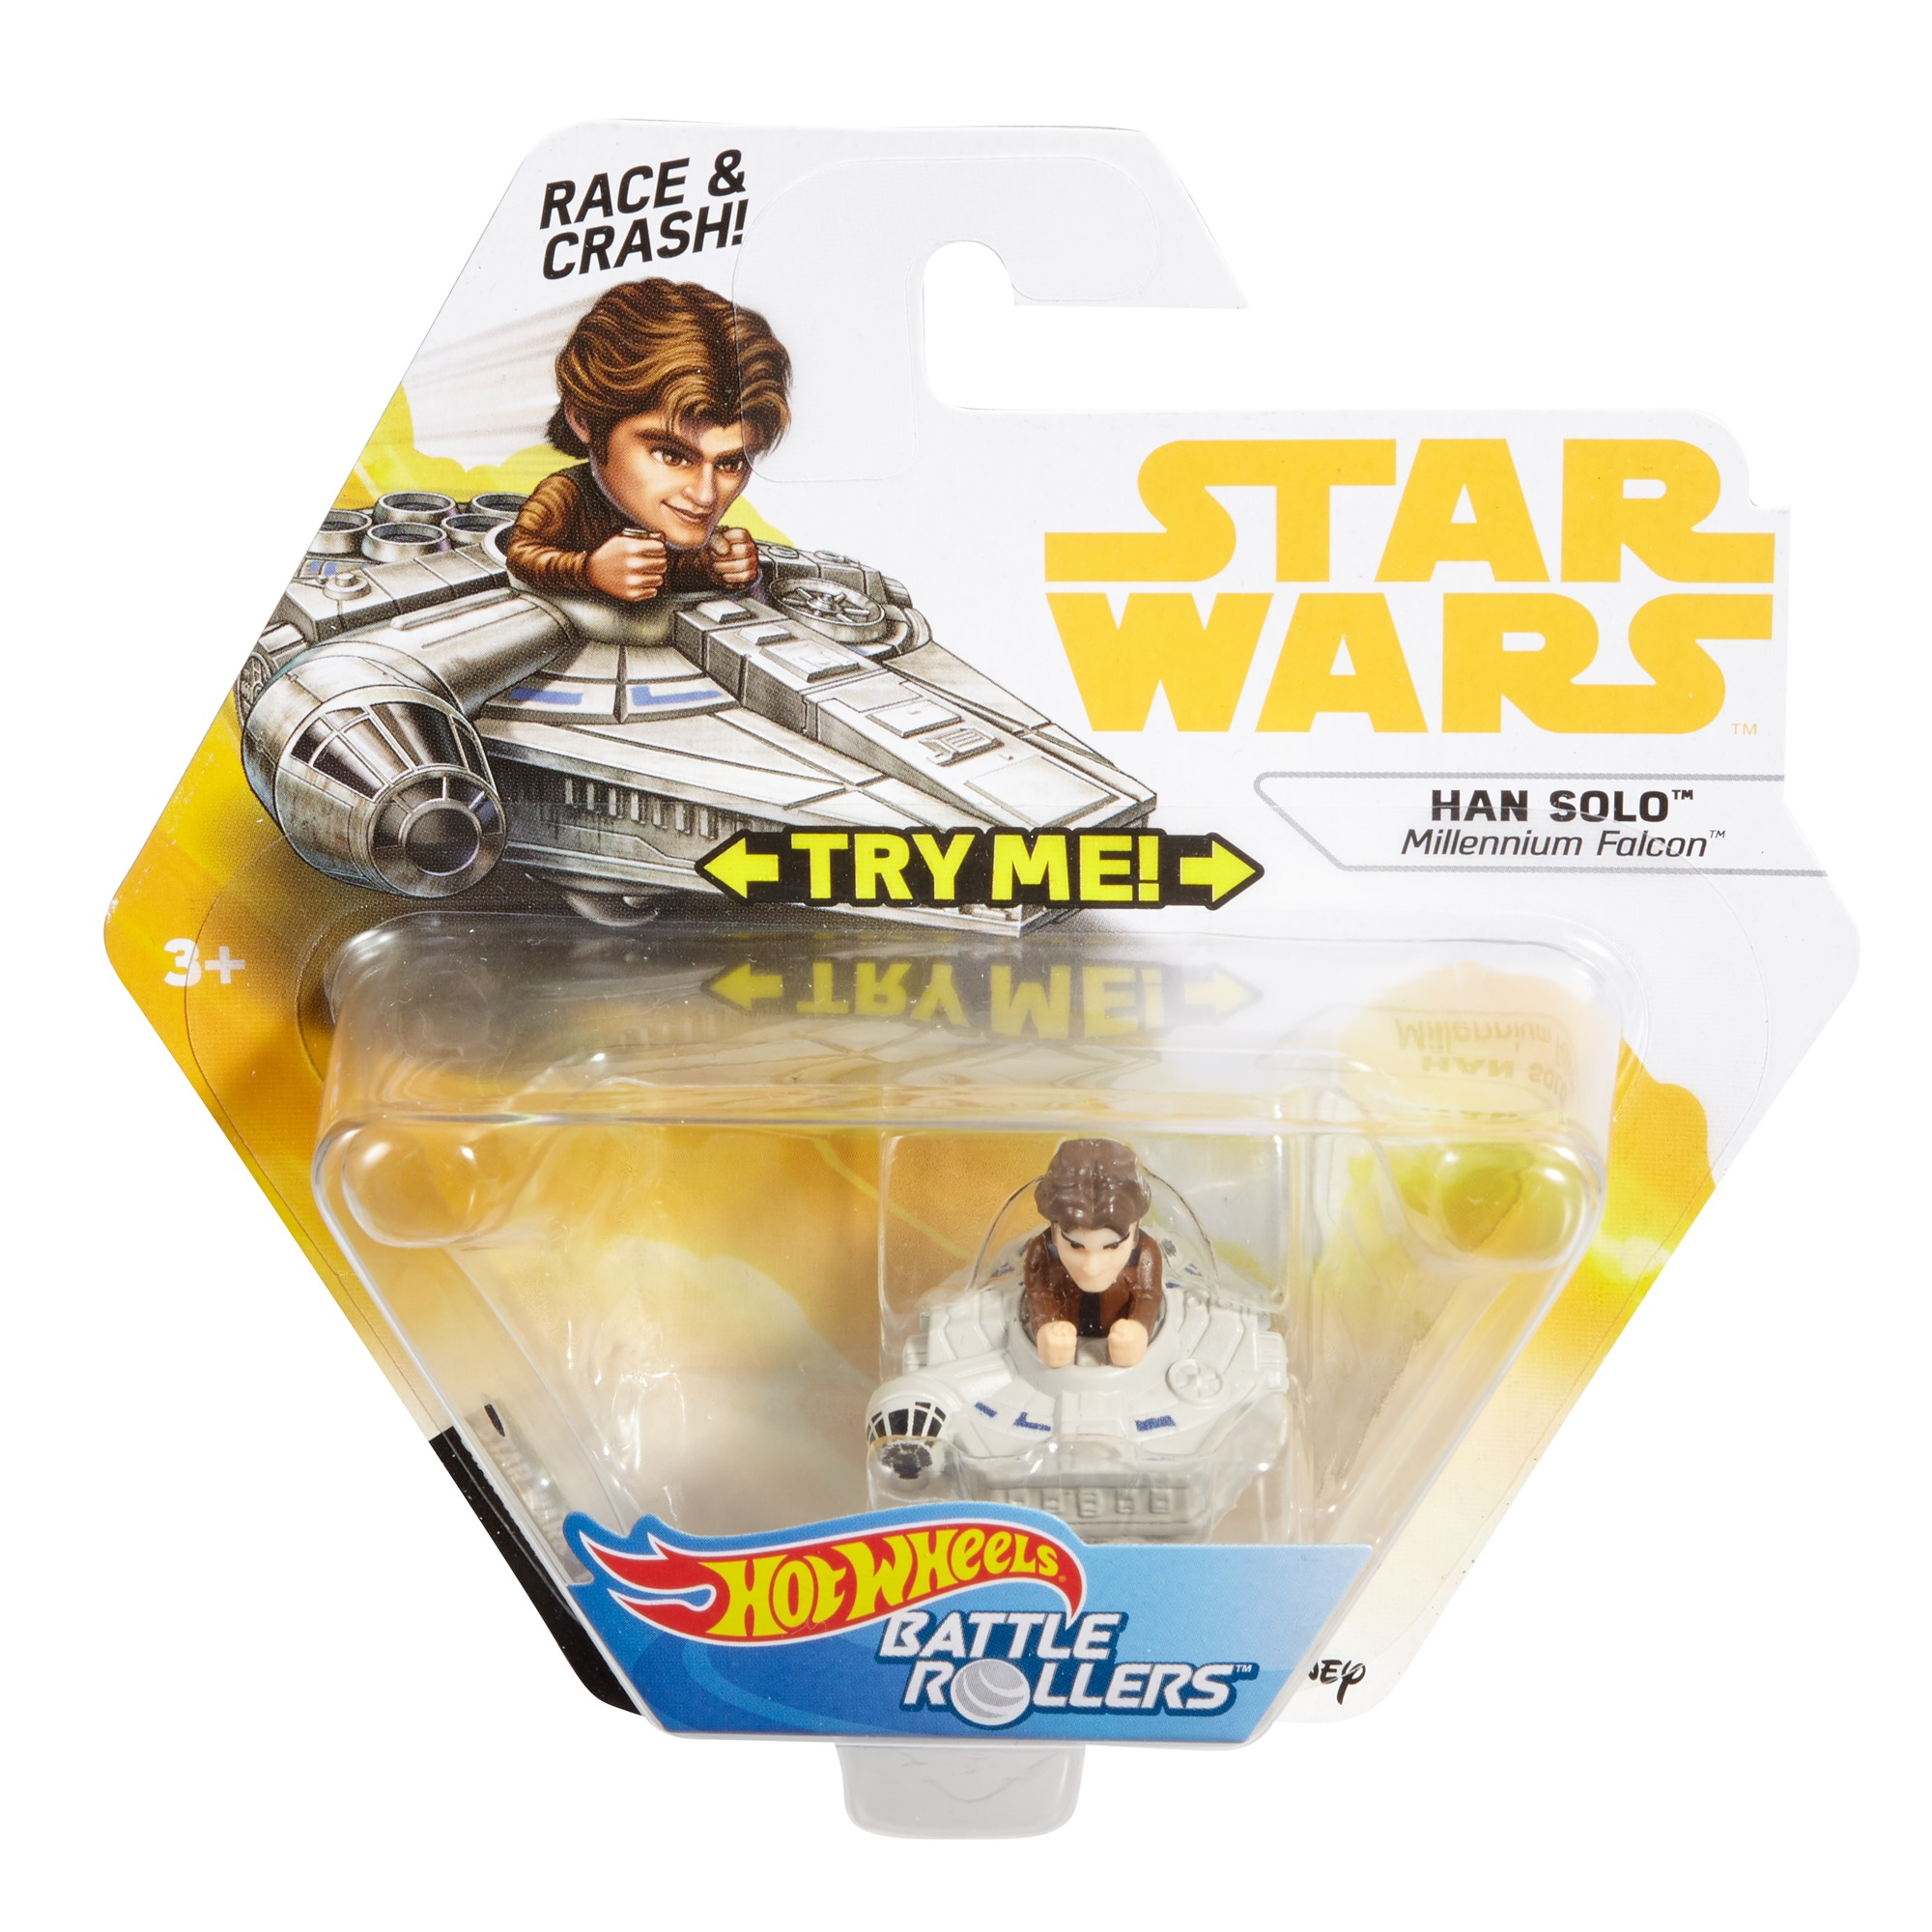 Solo: ASWS Han Solo Millennium Falcon Battle Roller Toy 1